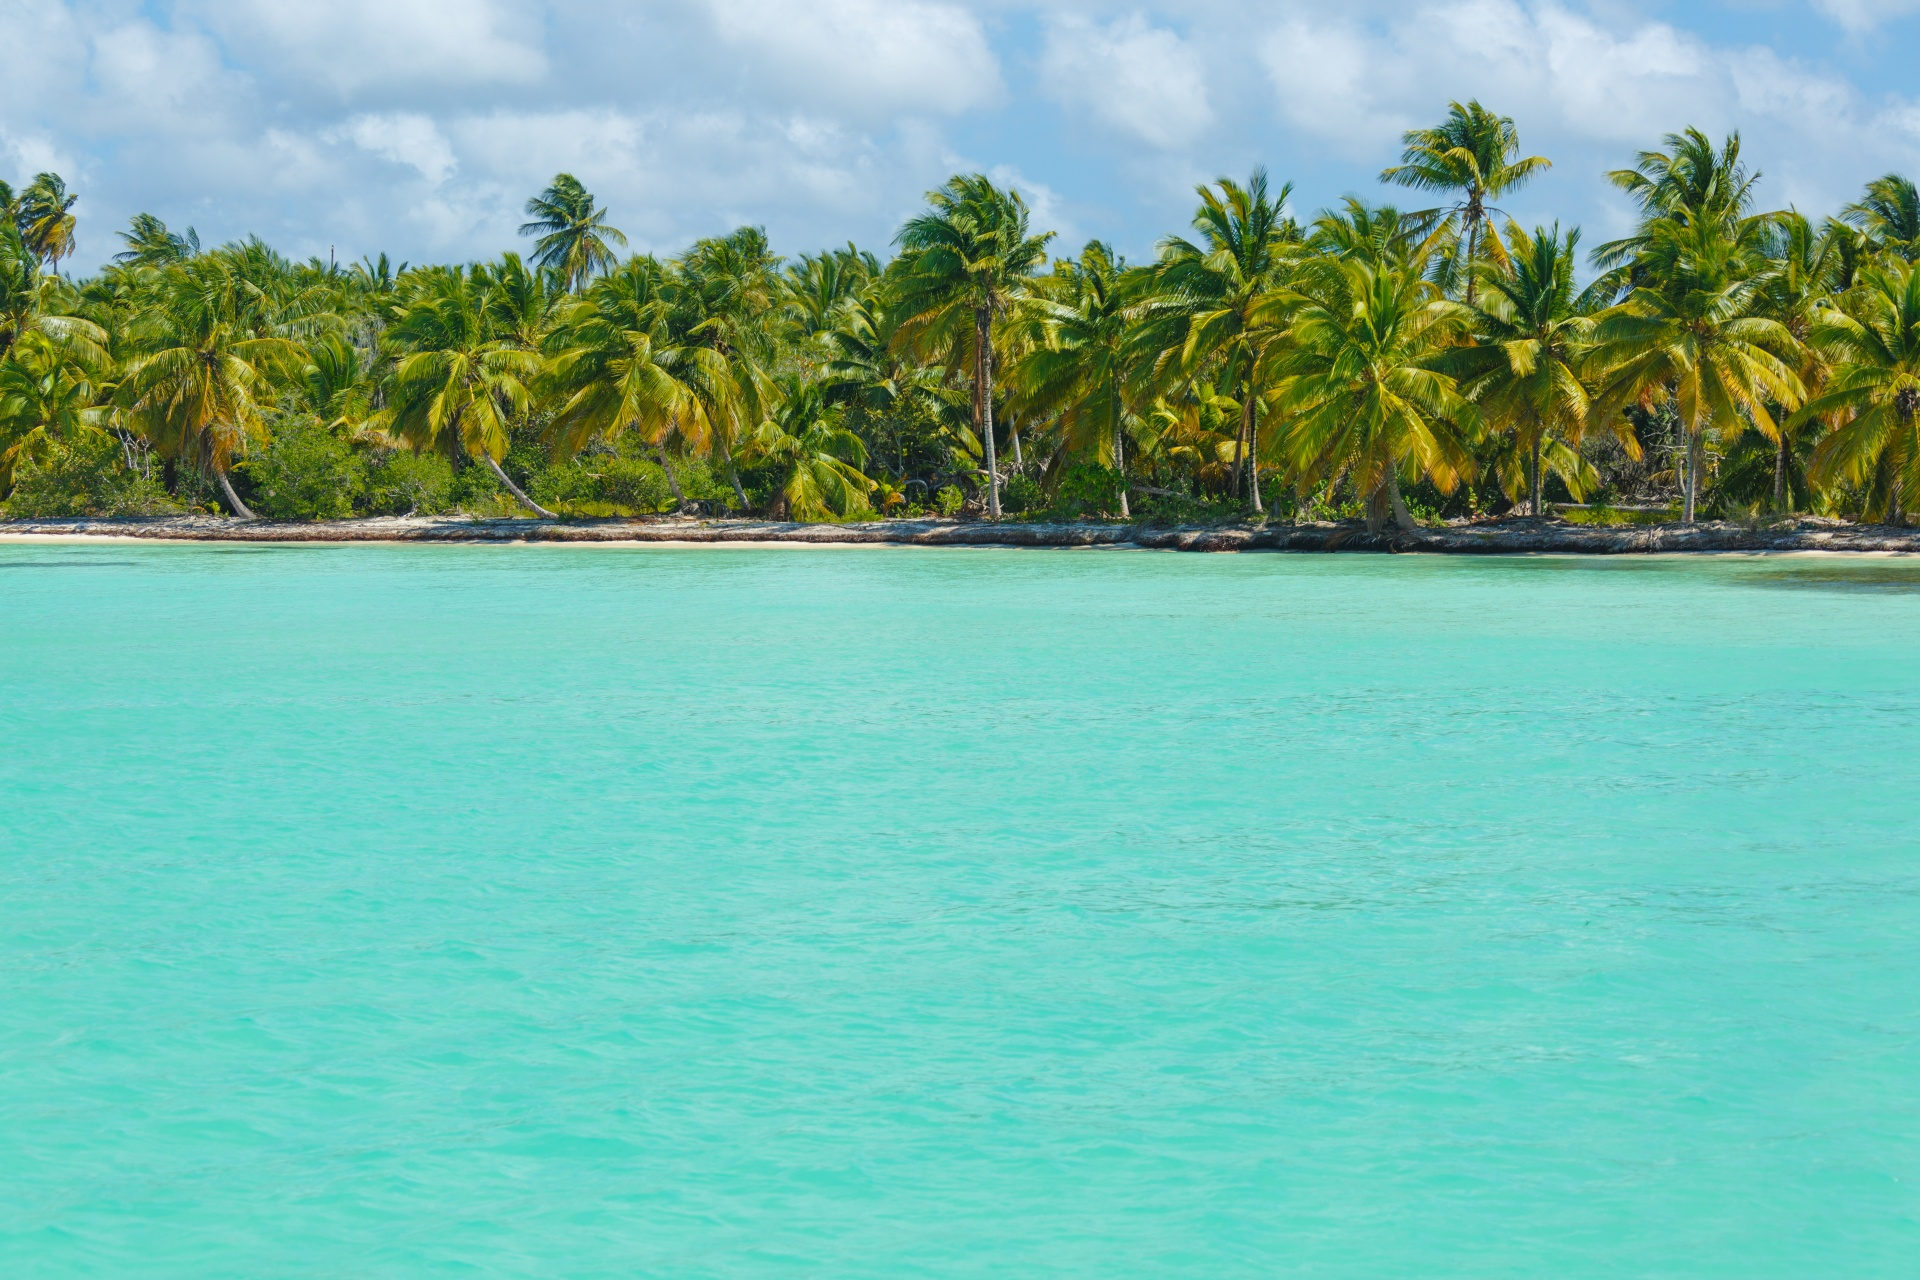 caribbean-island-coast-1457017105qVN